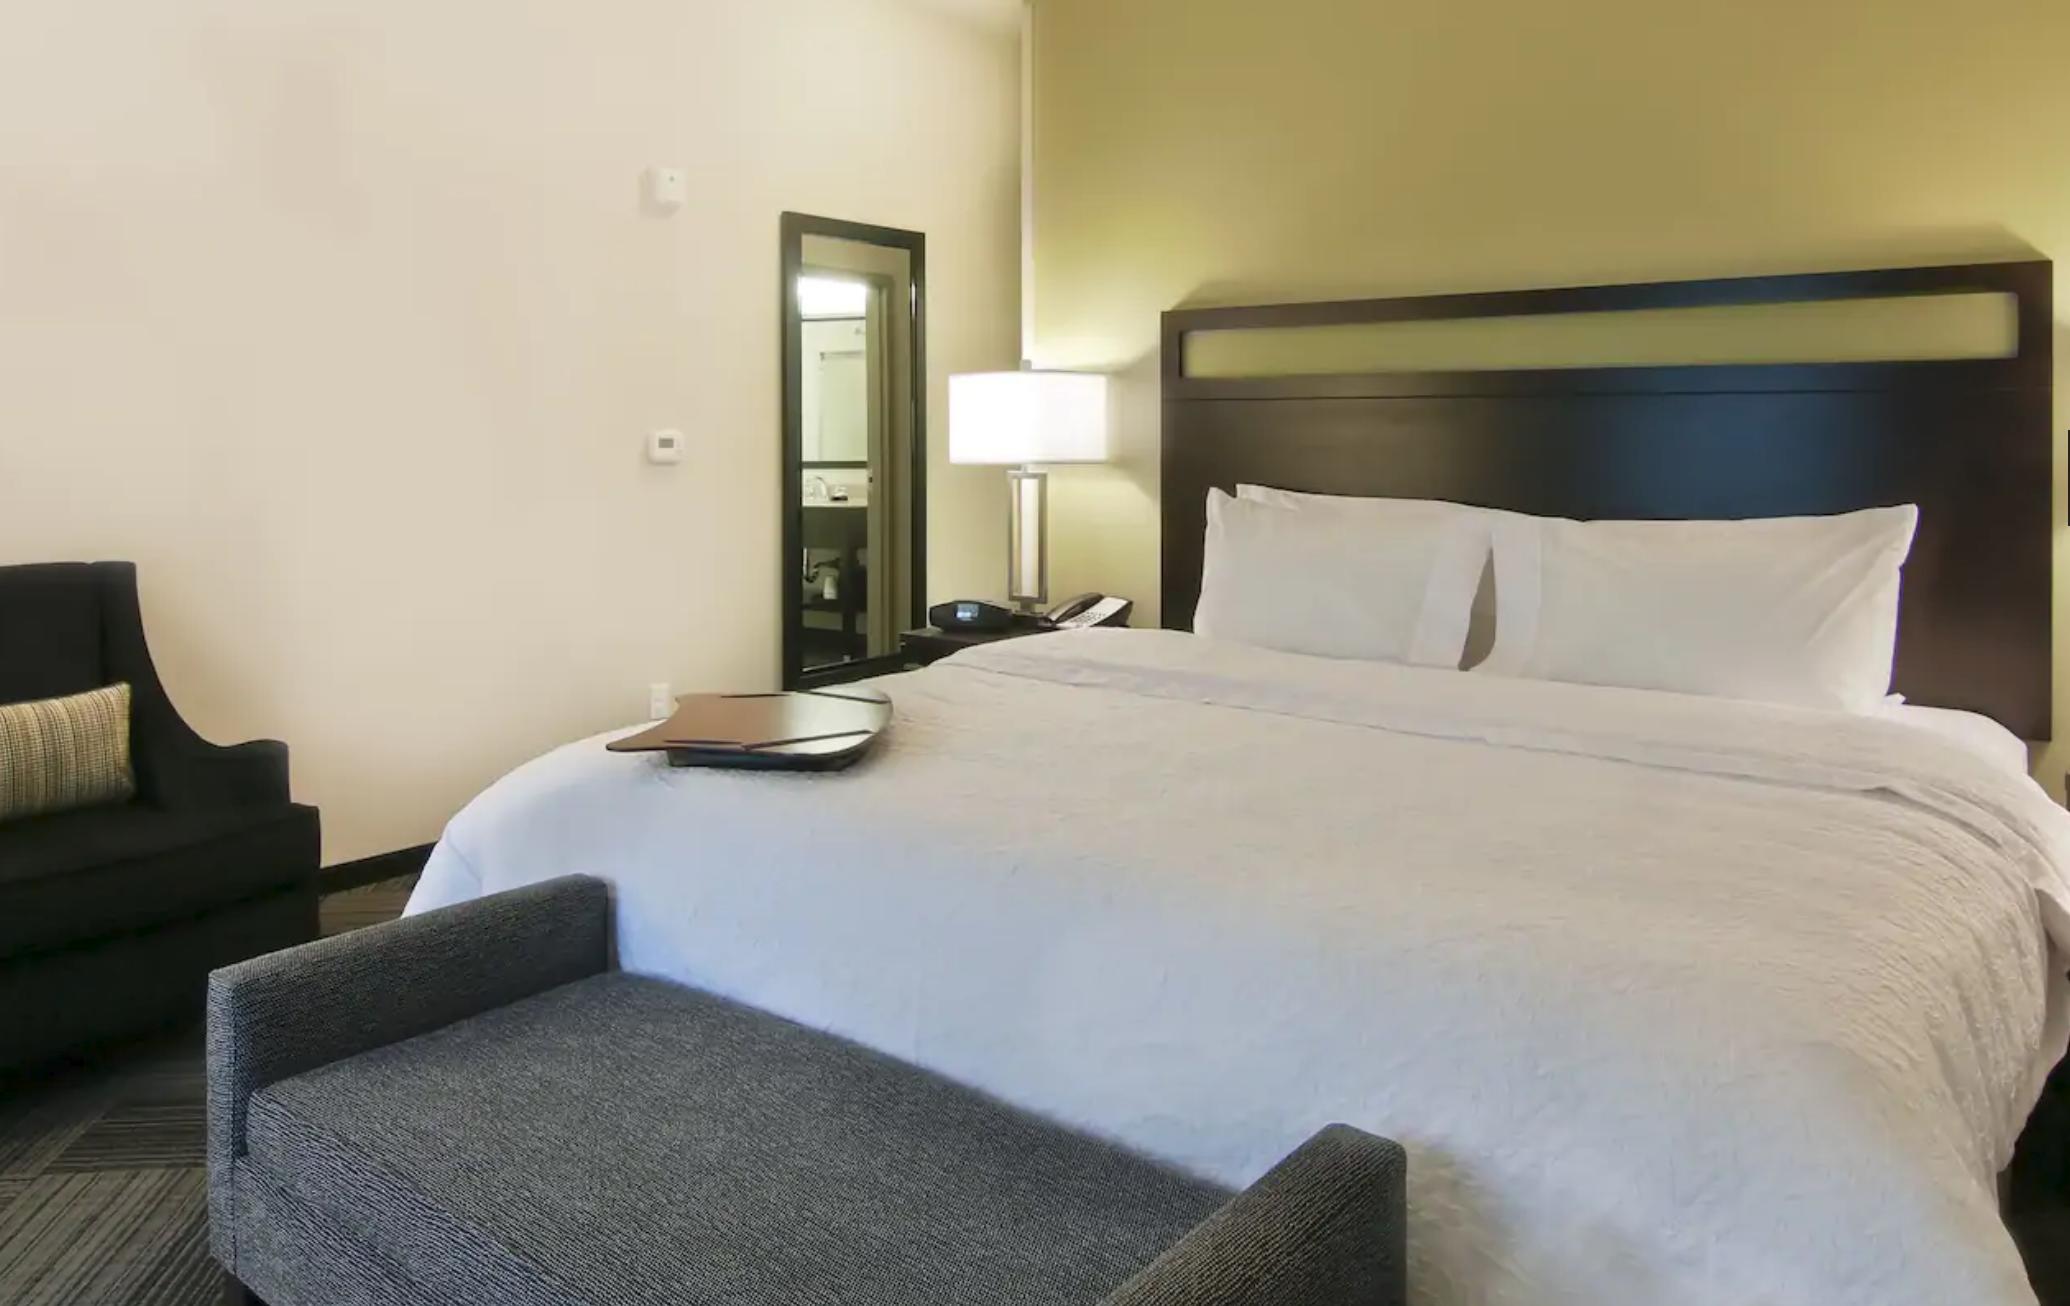 https://www.hotelsbyday.com/_data/default-hotel_image/4/21480/screenshot-2020-08-25-at-7-54-43-pm.png